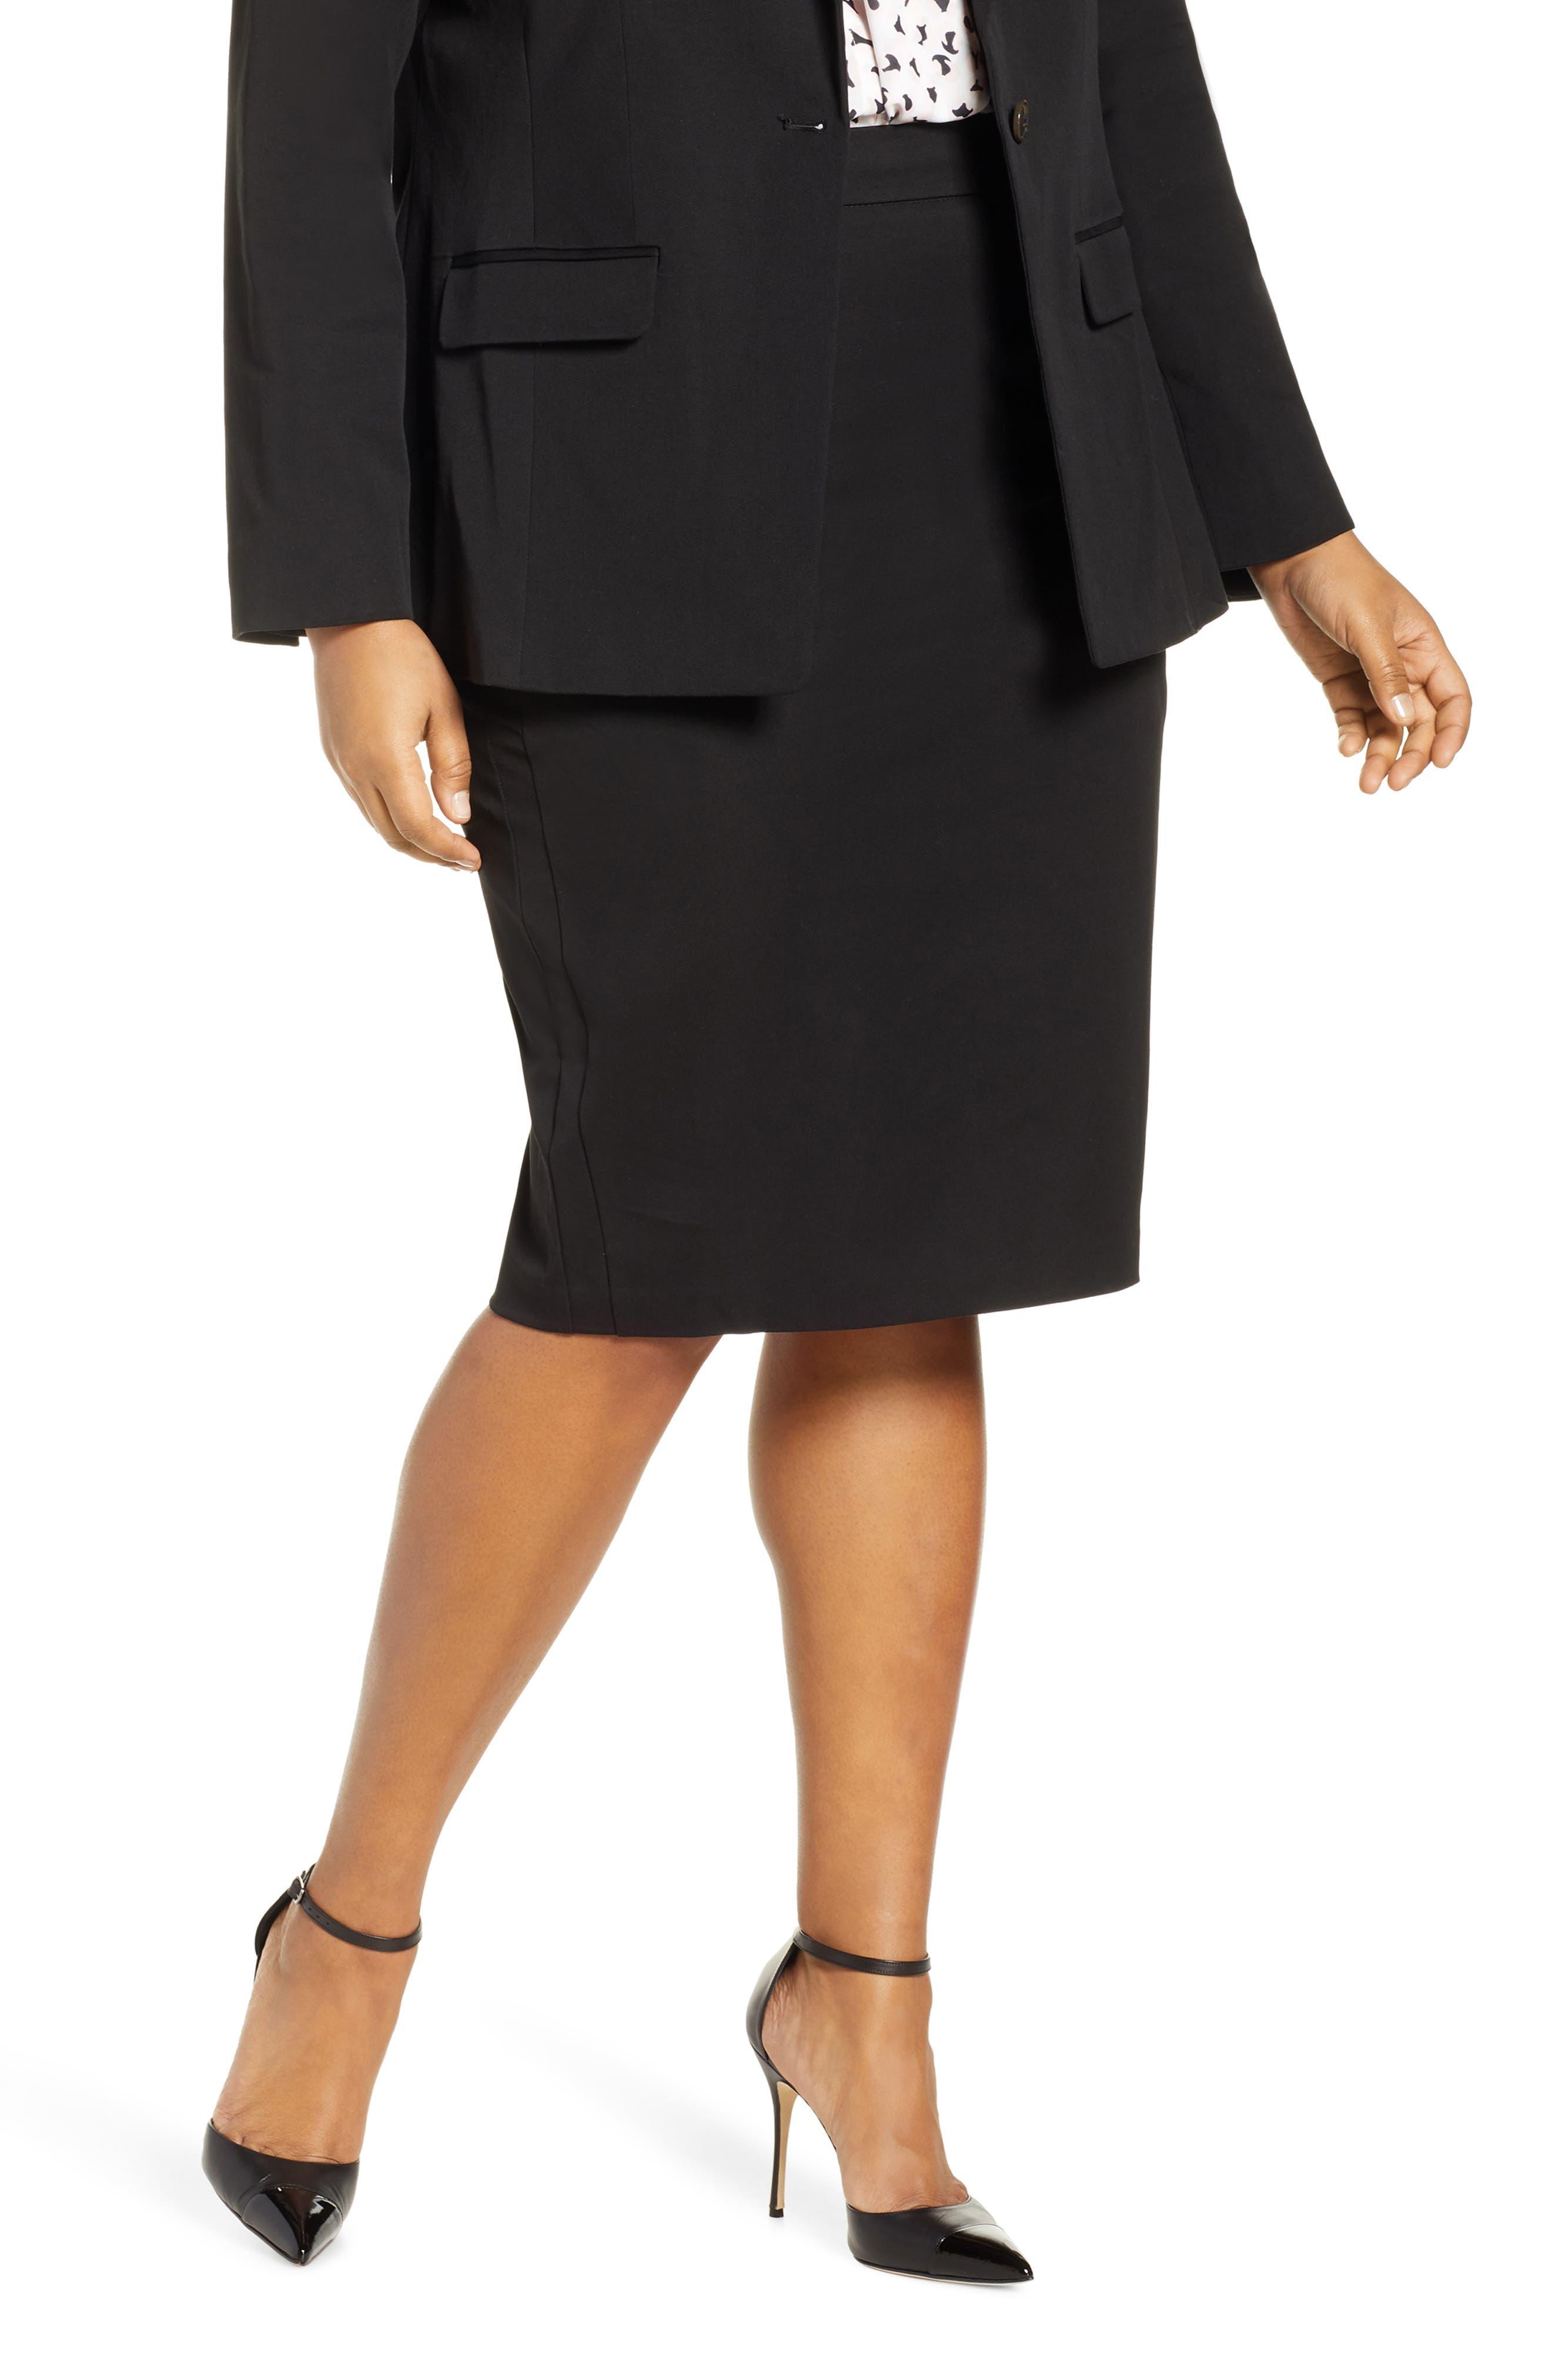 Plus Size Eloquii Stretch Pencil Skirt, Black